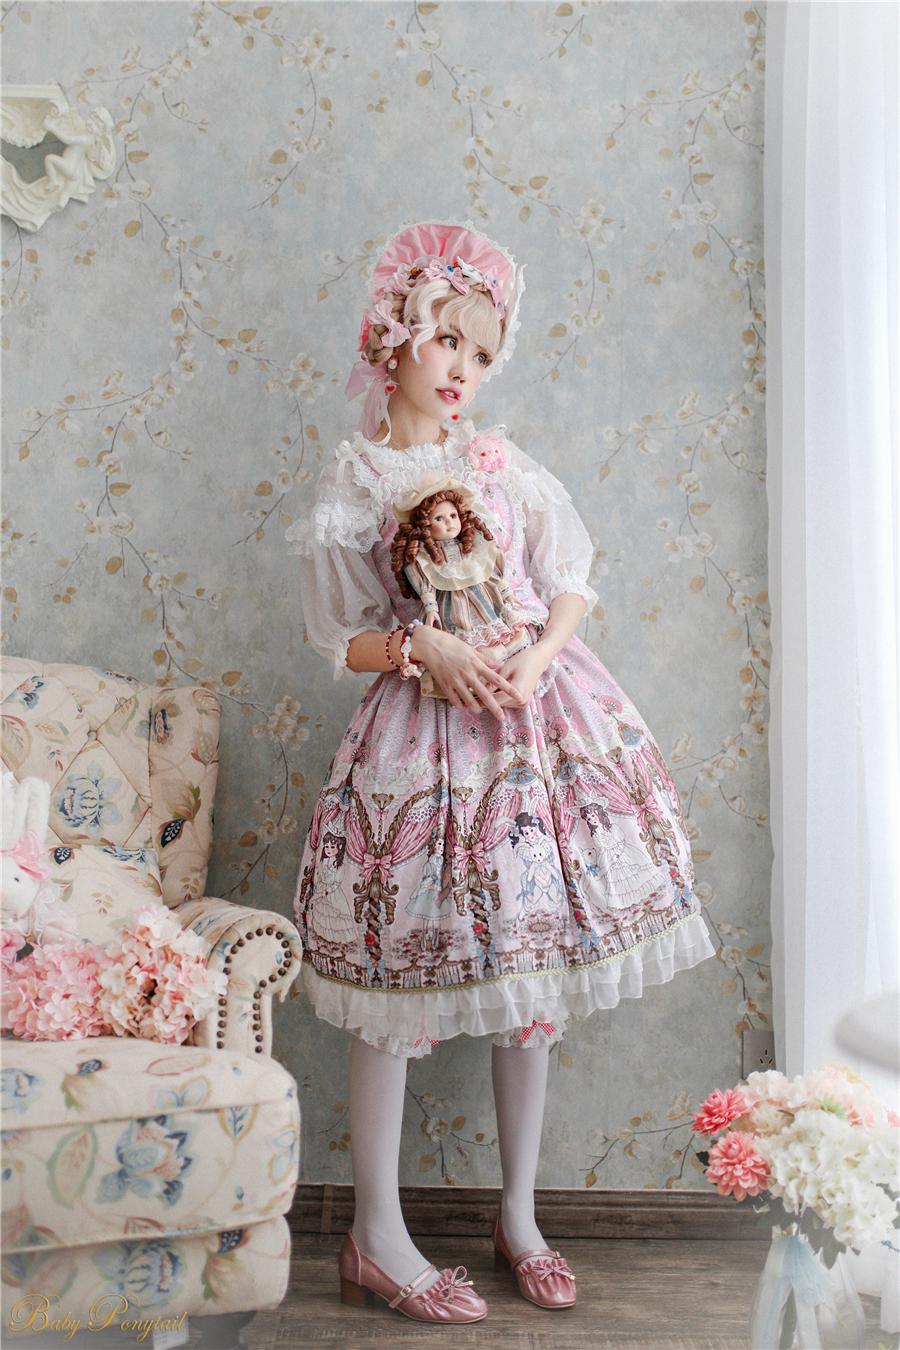 BabyPonytail_Model Photo_My Favorite Companion_JSK Pink_Kaka_01.jpg